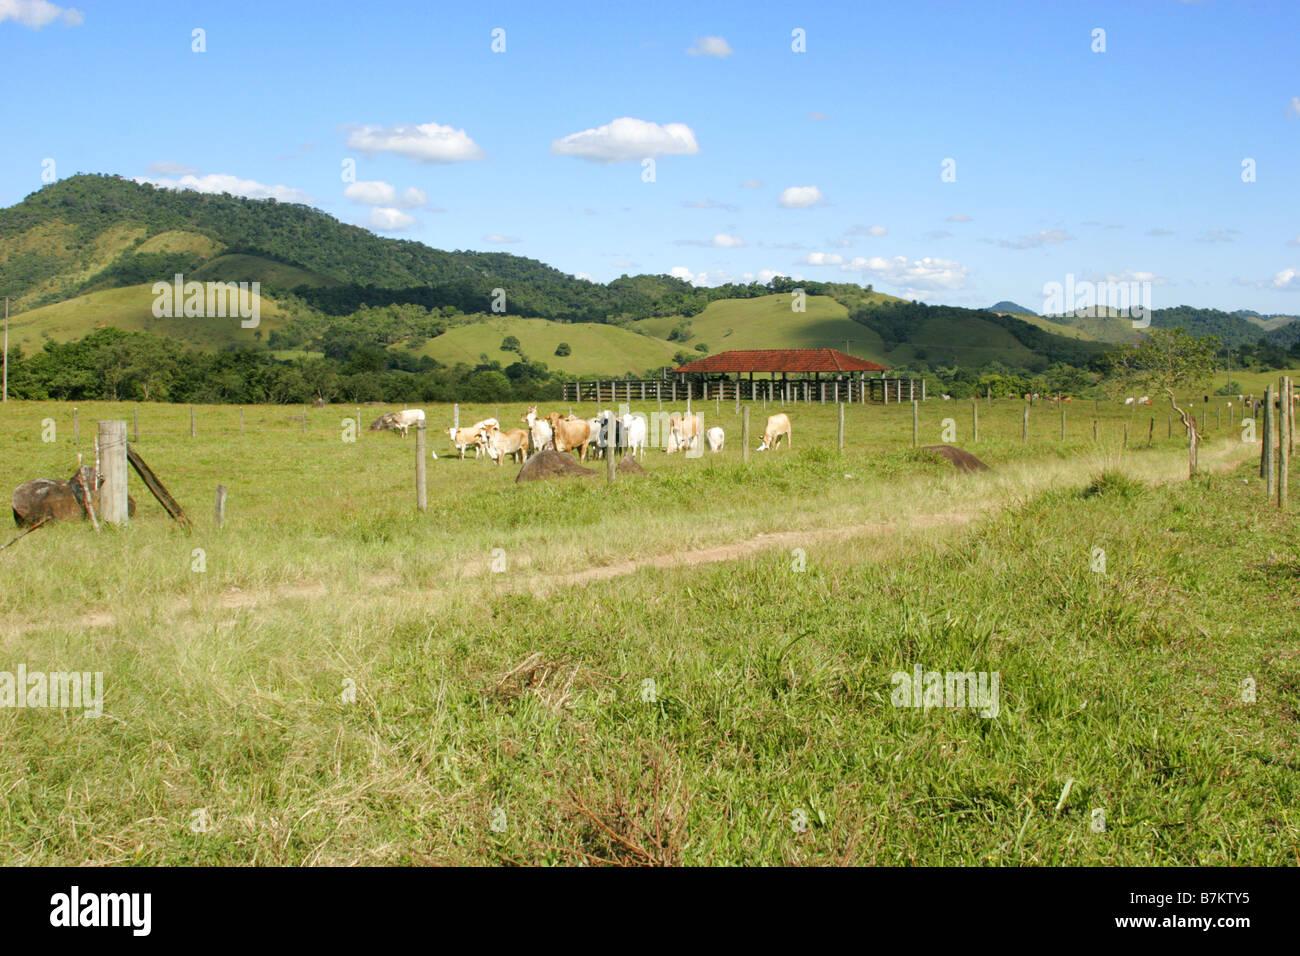 Brahmin Cattle herd standing on pastureland with hills of Atlantic Rainforest in distance Rio de Janeiro state Brazil - Stock Image